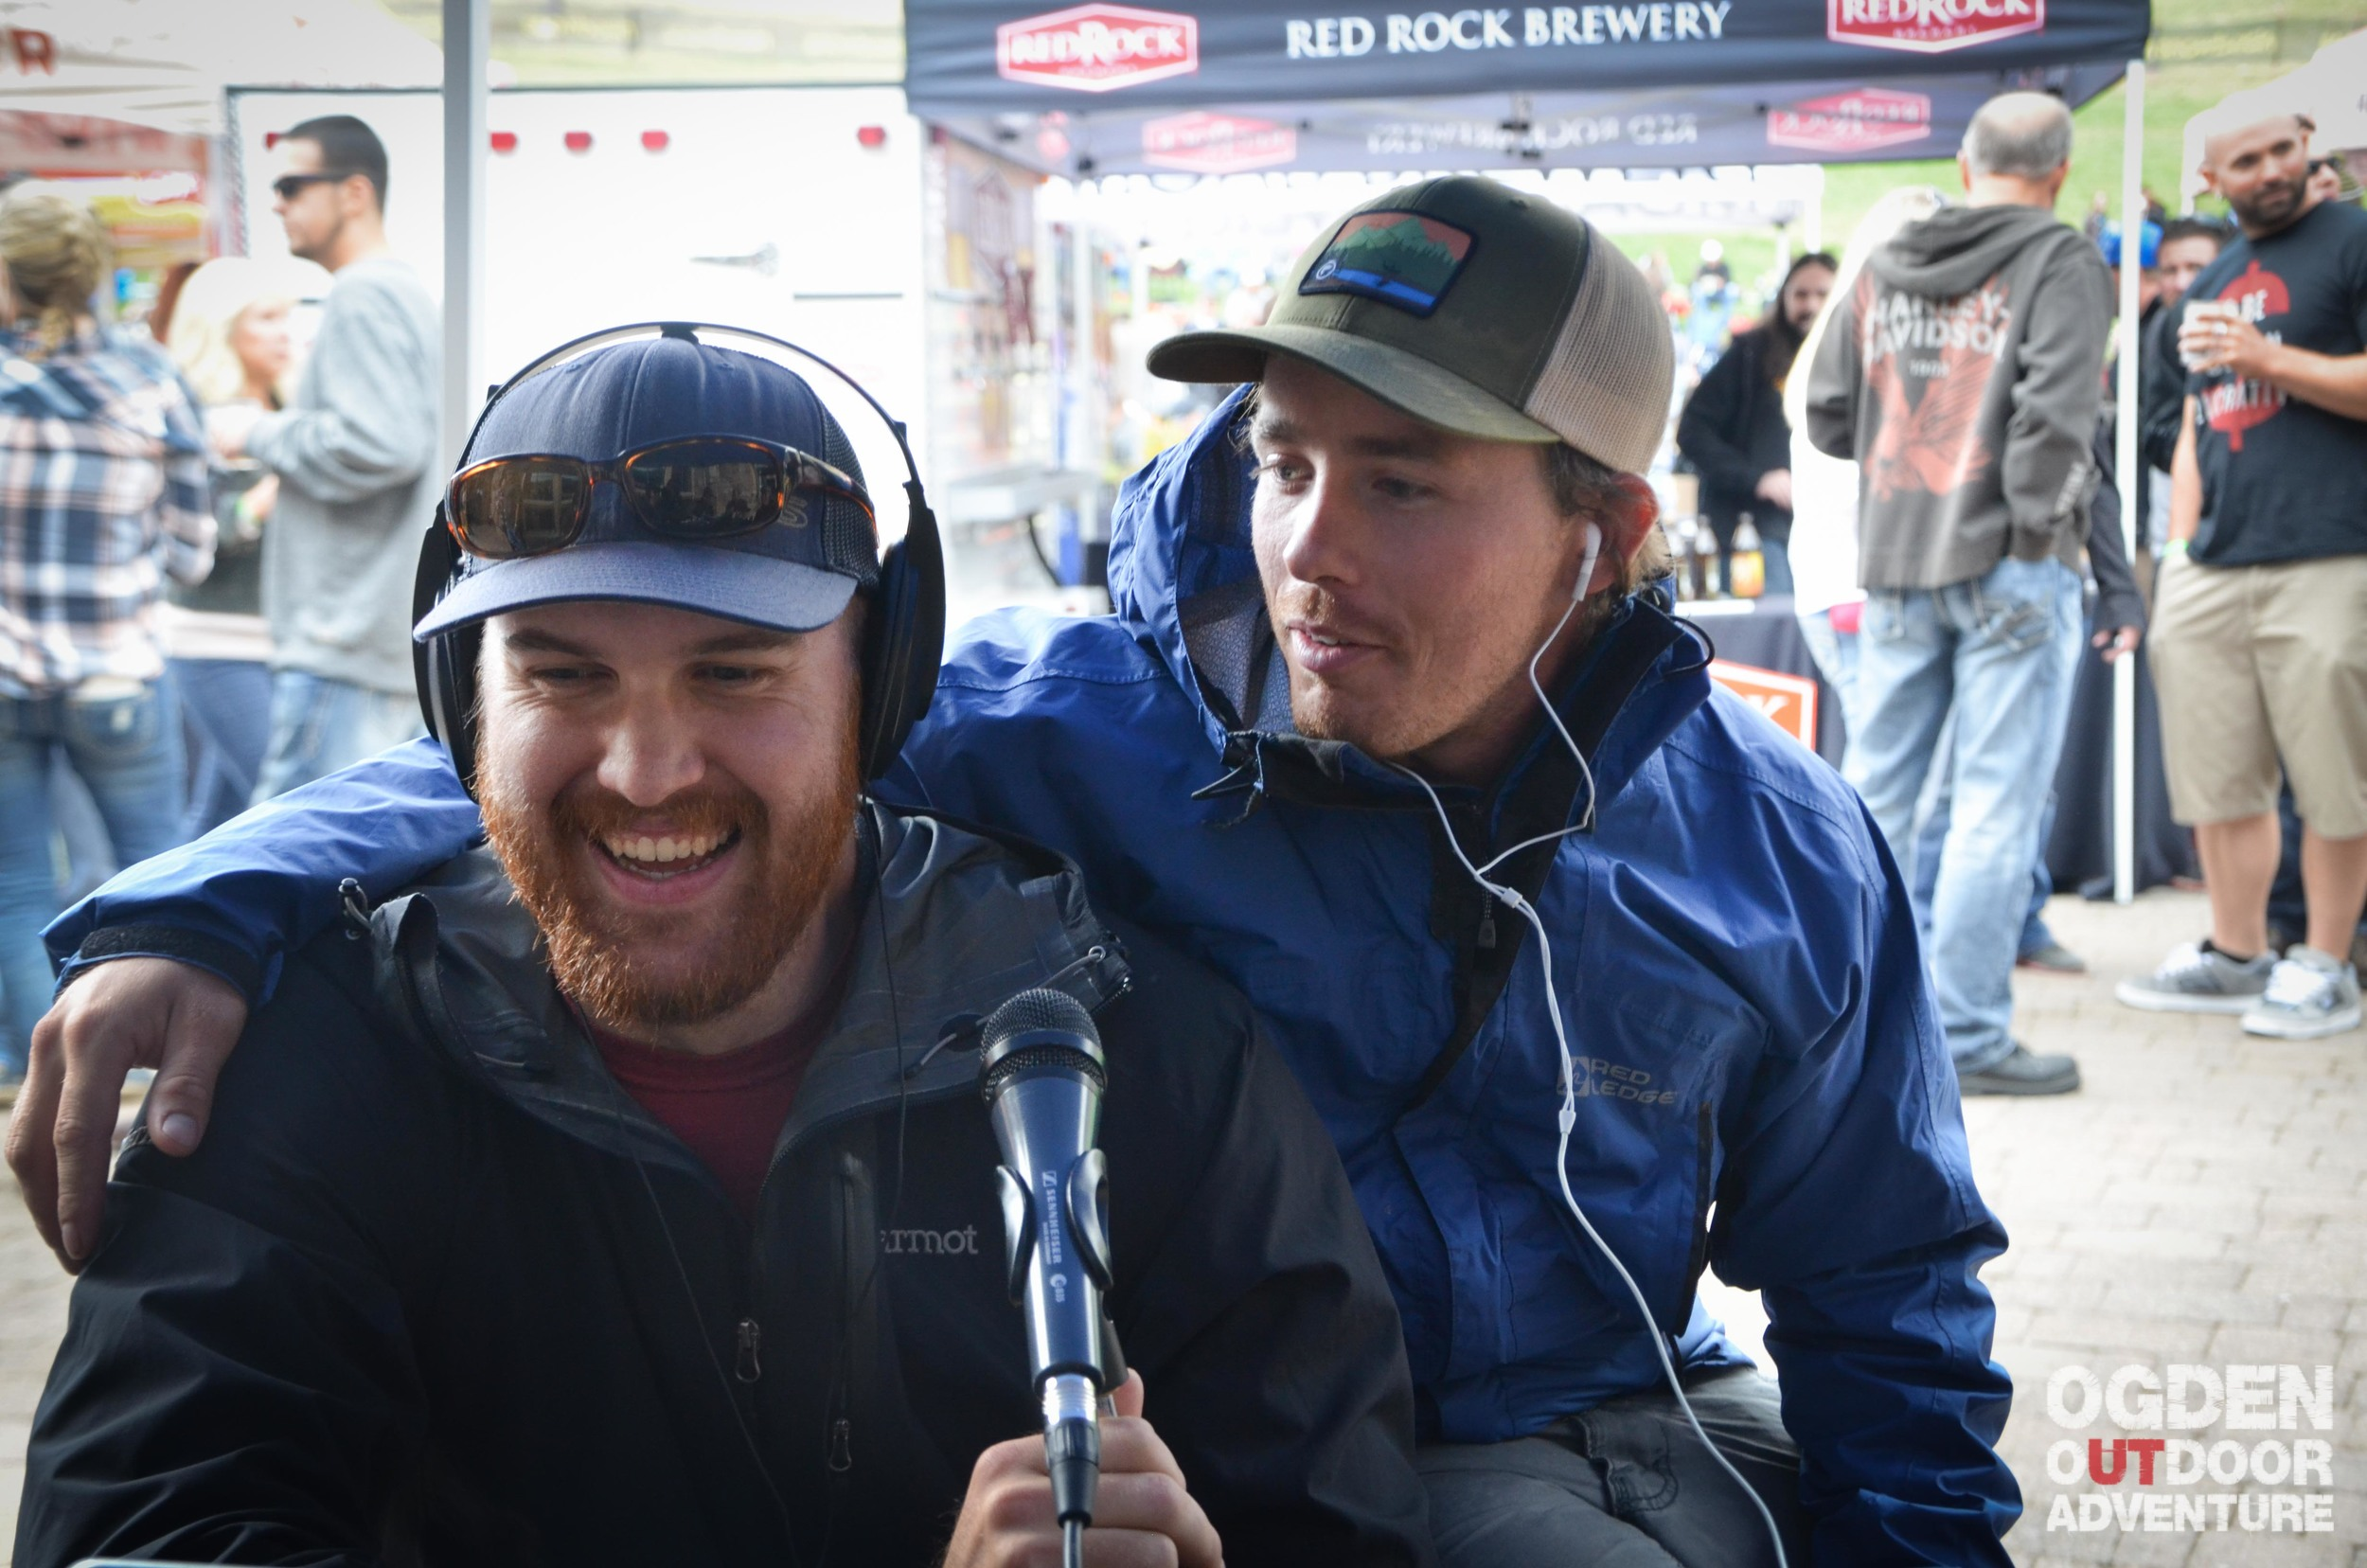 2015 Snowbasin Beer Festival-22.jpg